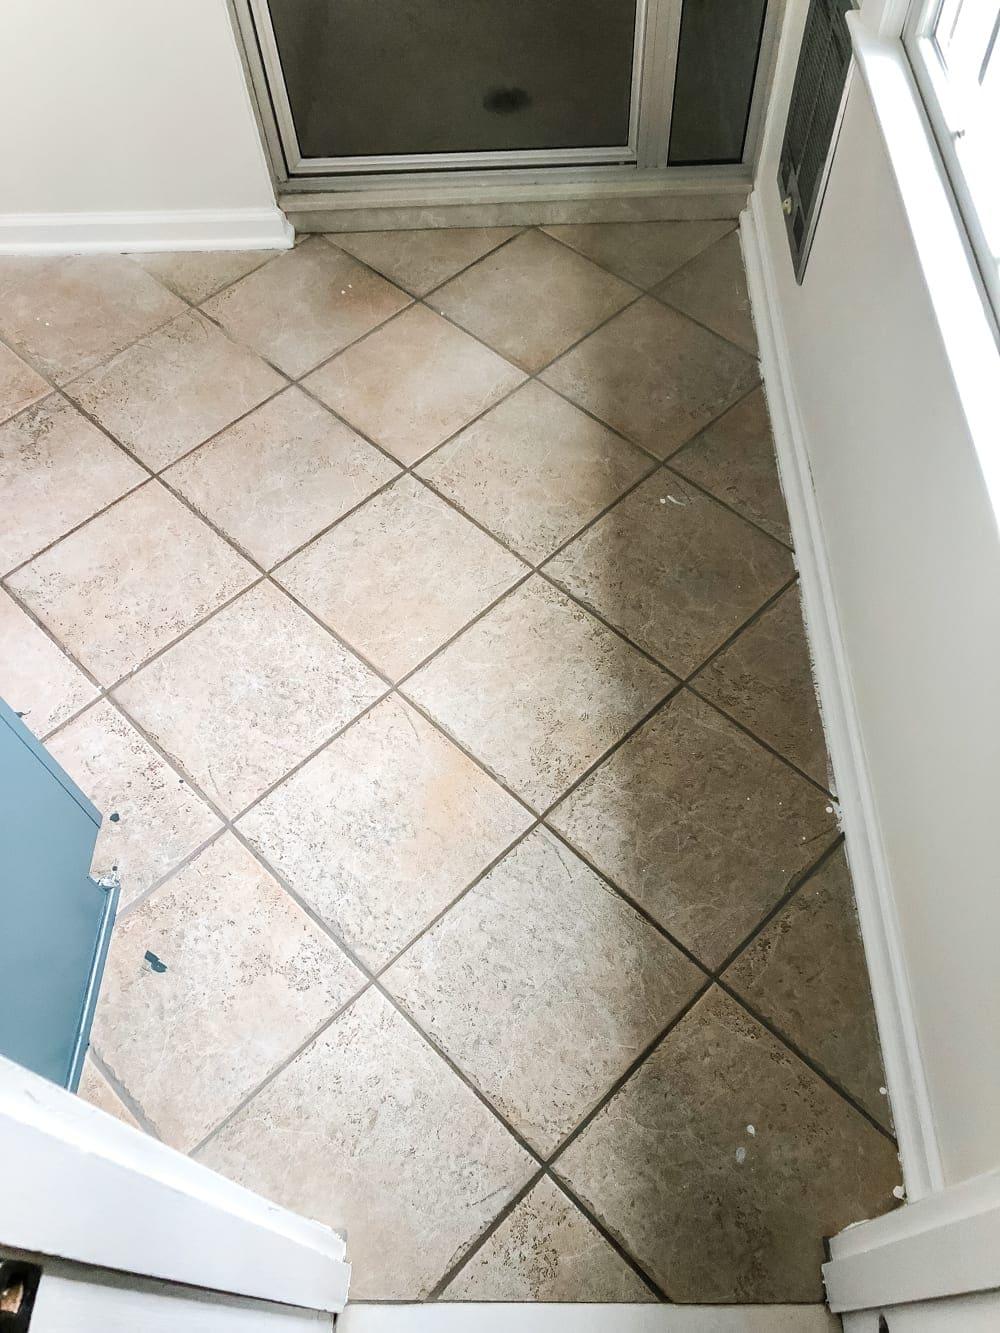 How to install sheet vinyl flooring over old tile